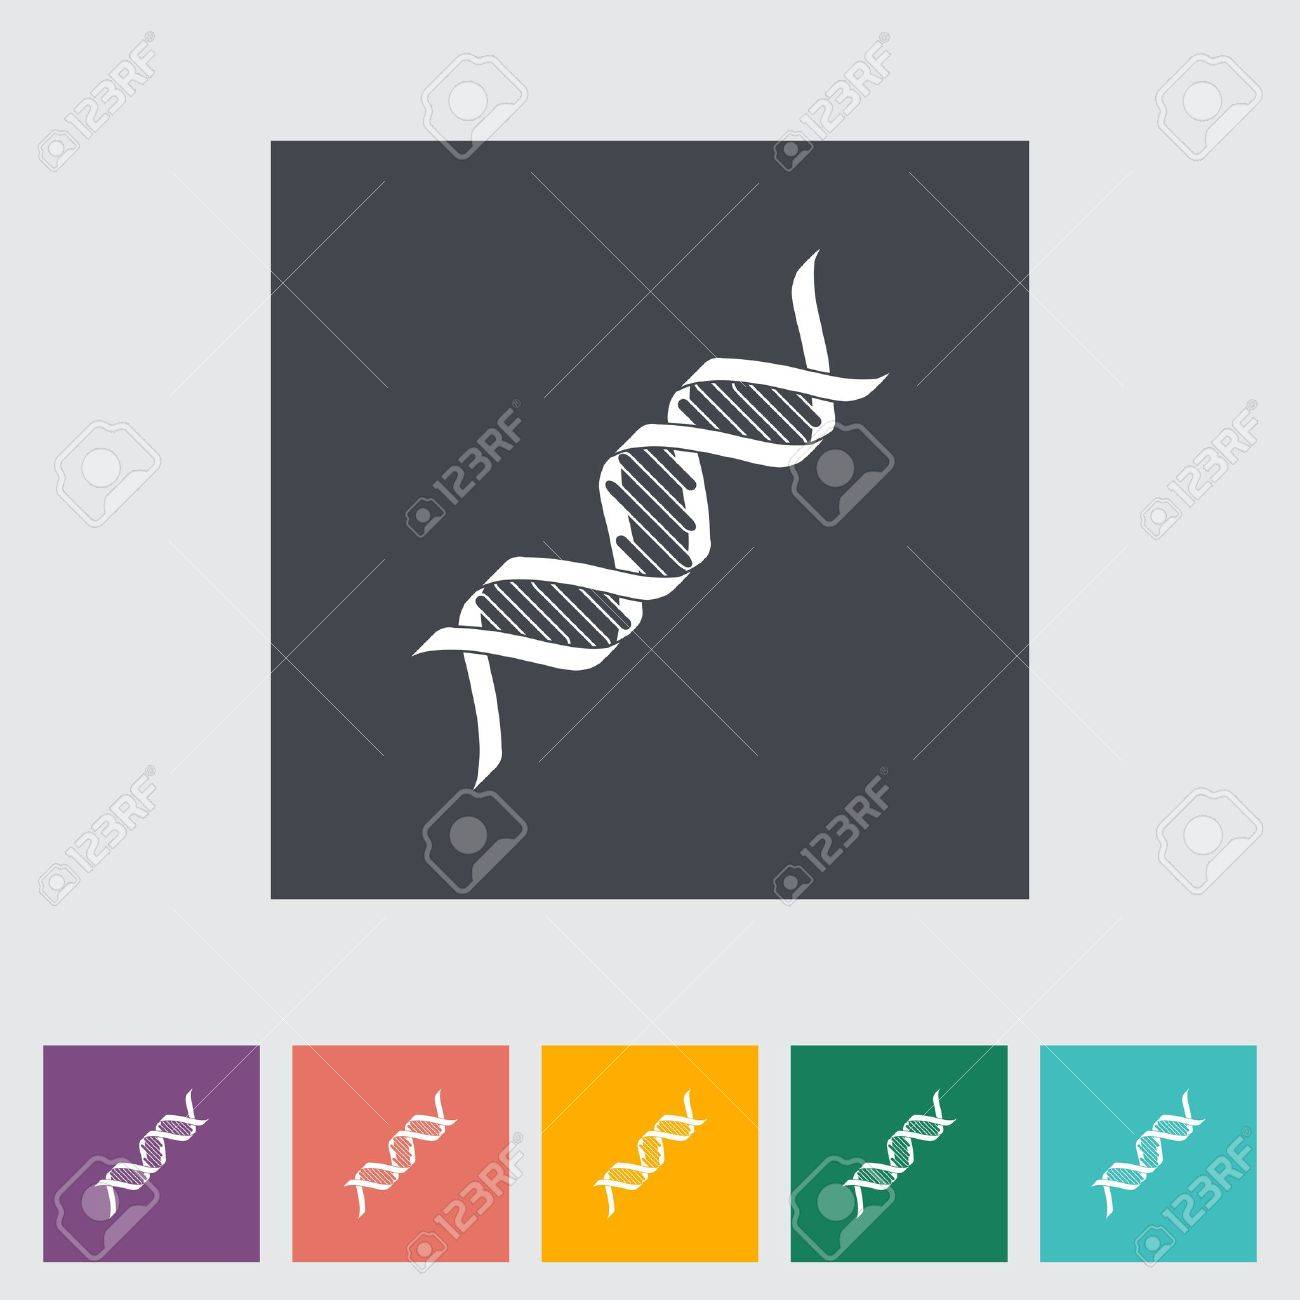 DNA flat icon. Vector illustration EPS. Stock Vector - 21025897